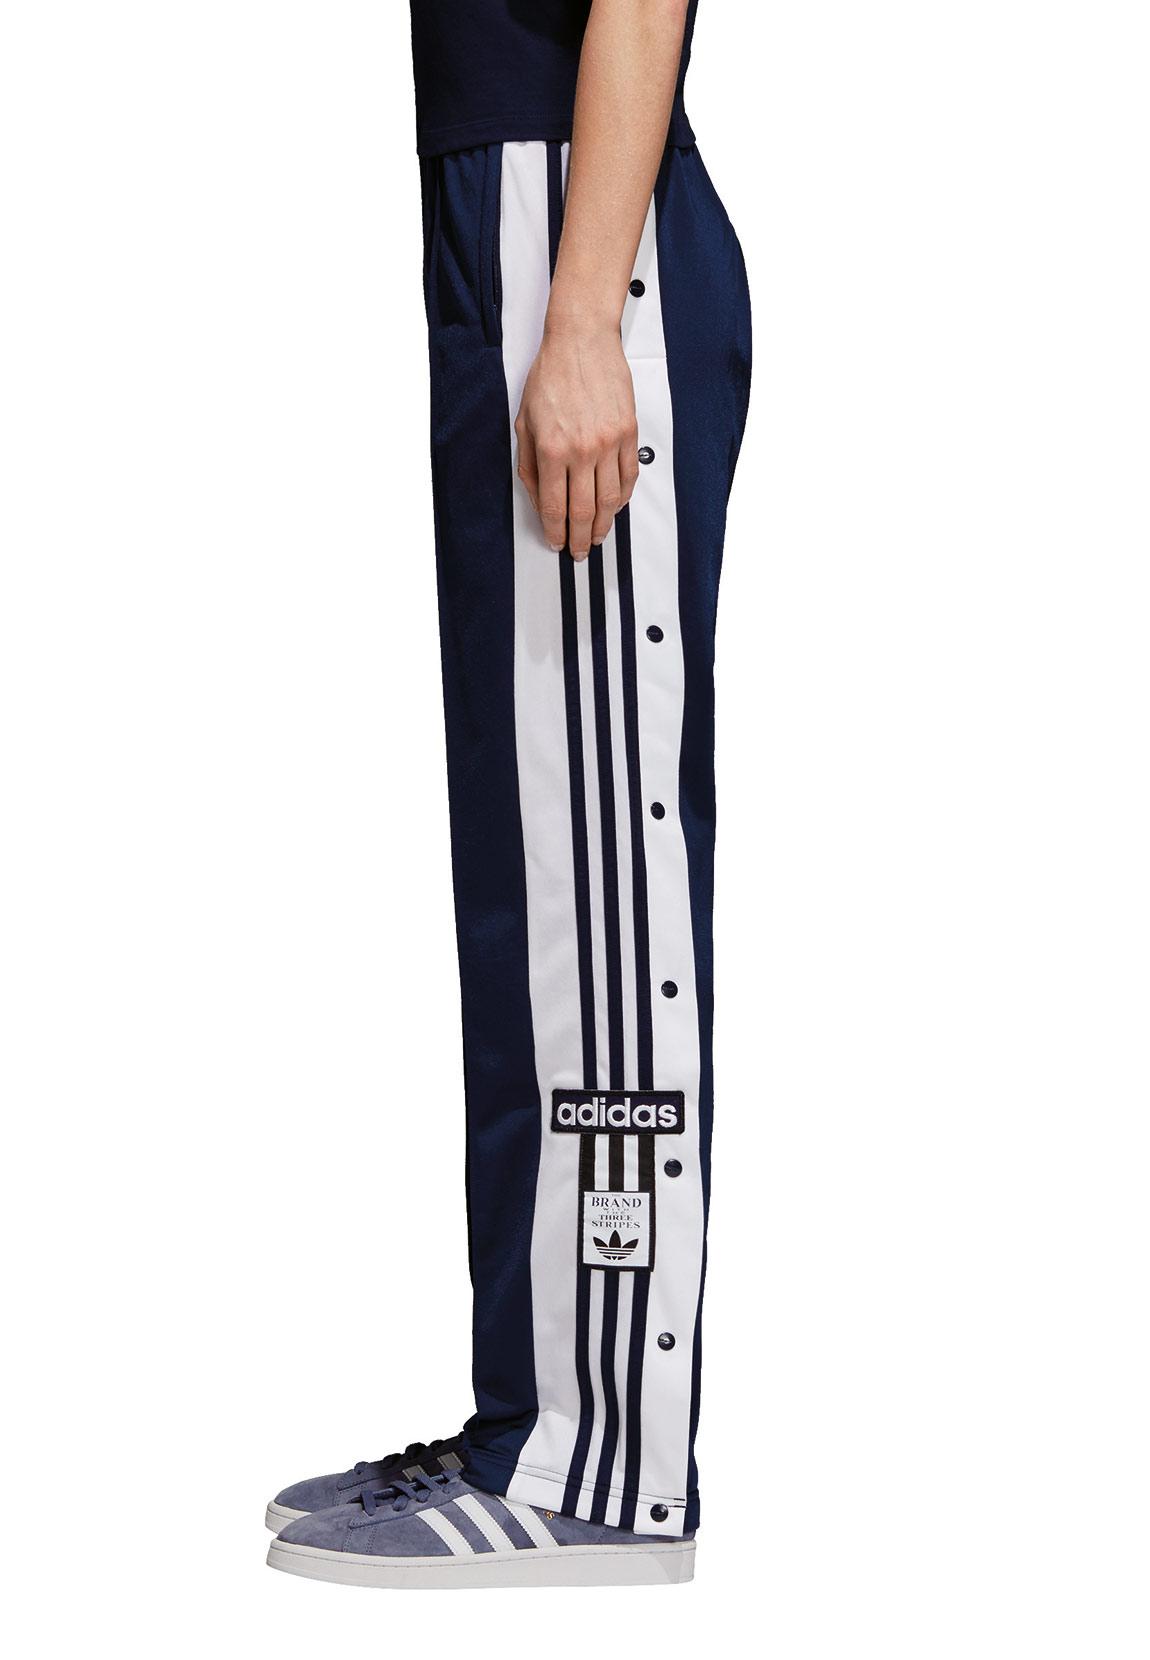 adidas original damen jogginghose